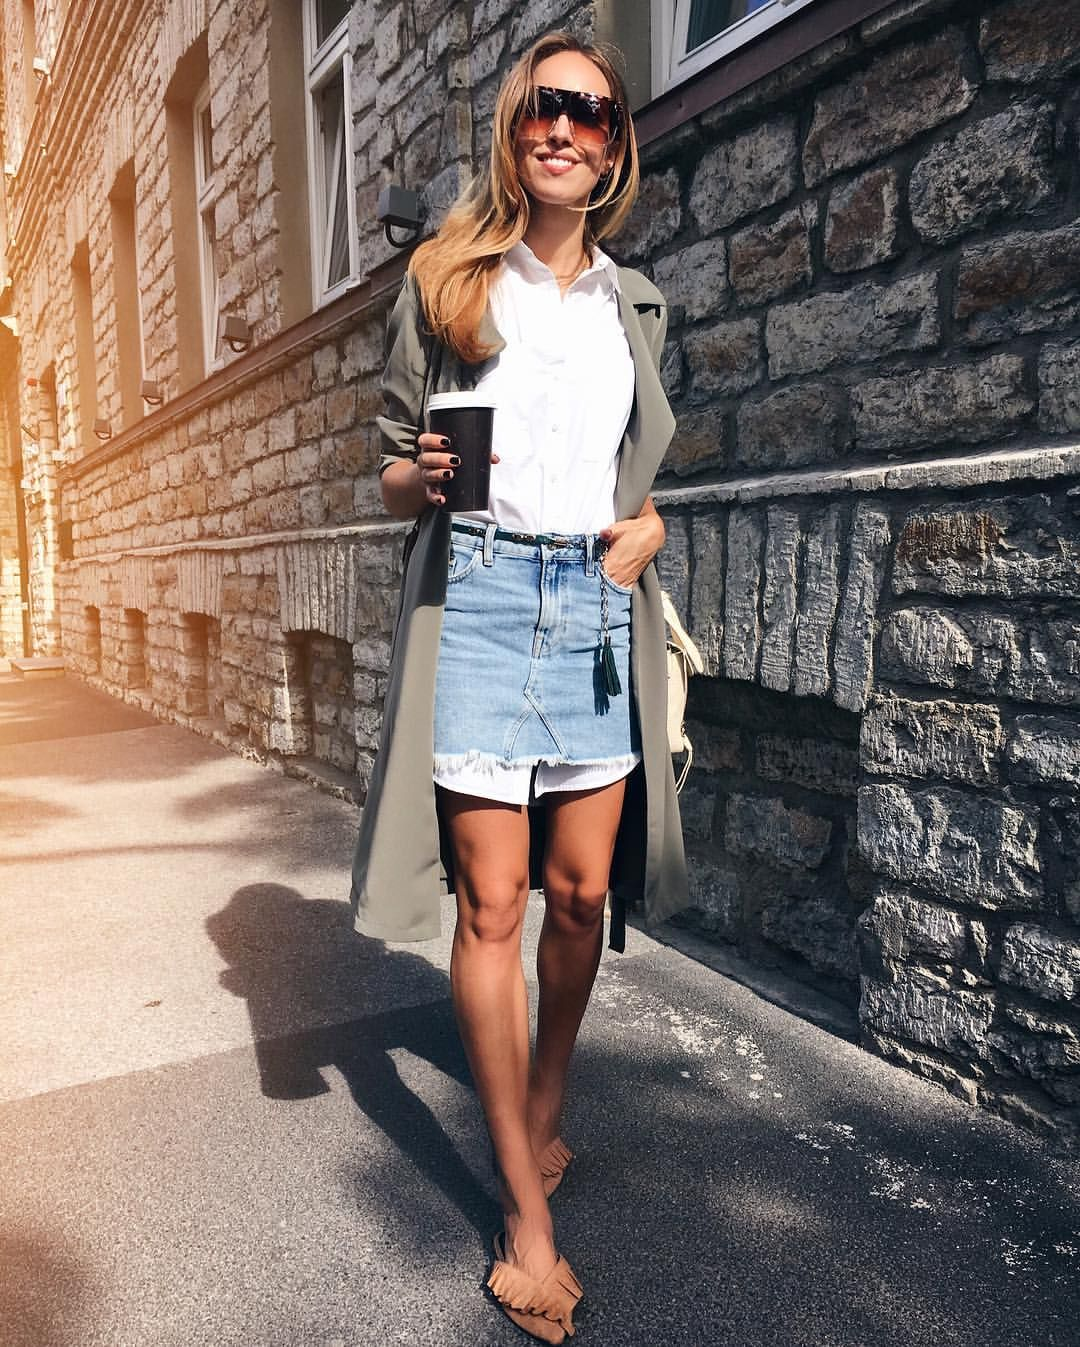 Denim Mini Skirt Over White Shirt Dress Kristjaana Kristjaana